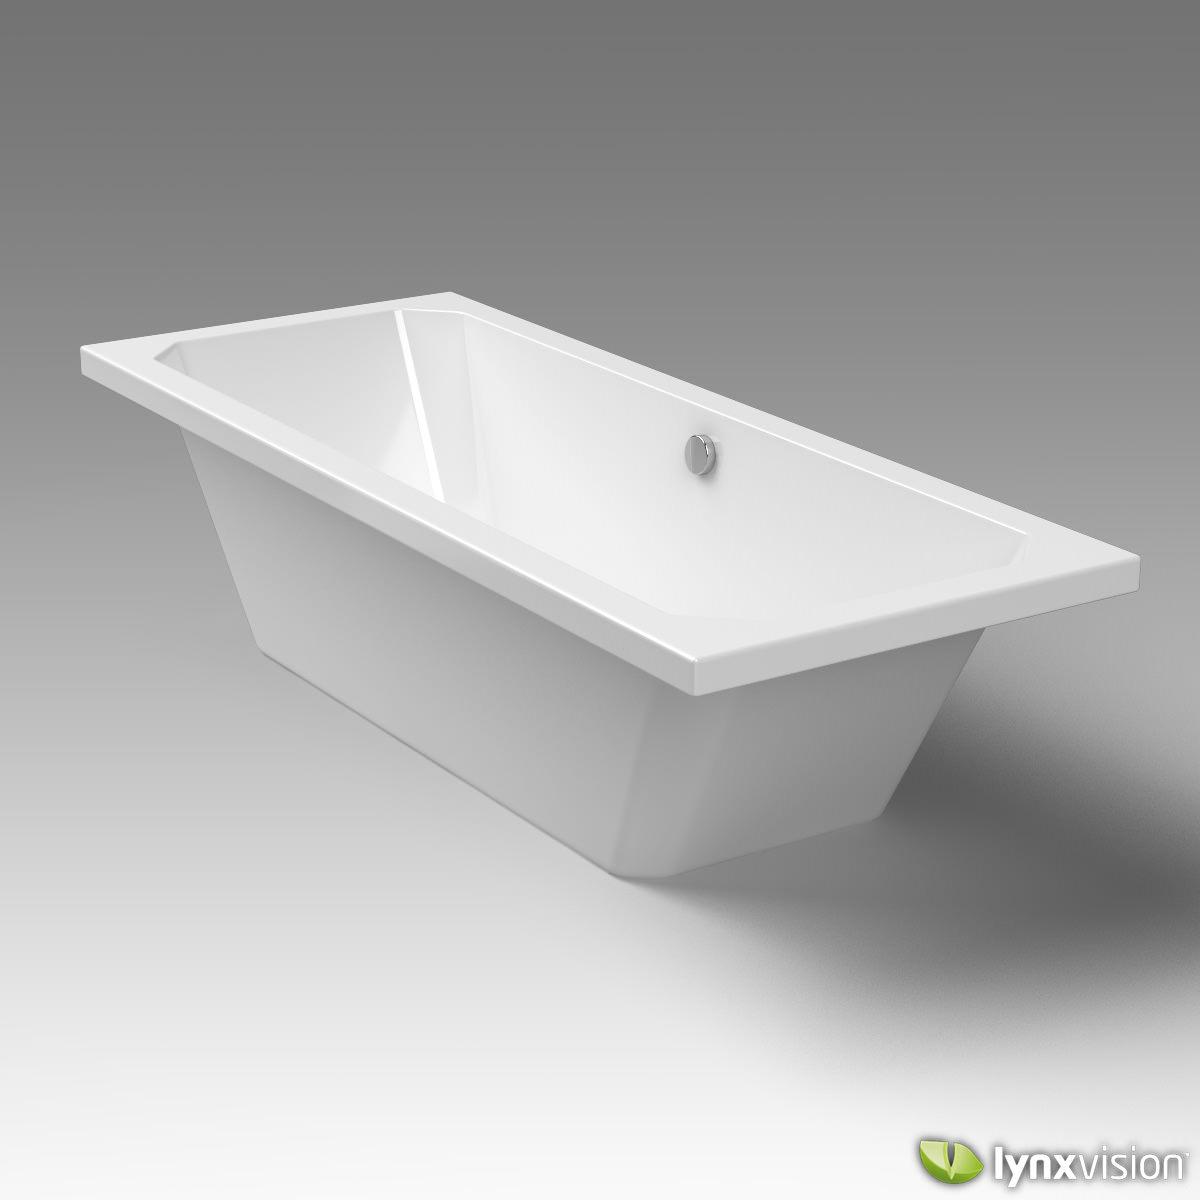 duravit bathtub 1930 series 3d model max obj fbx c4d lwo lw lws lxo. Black Bedroom Furniture Sets. Home Design Ideas